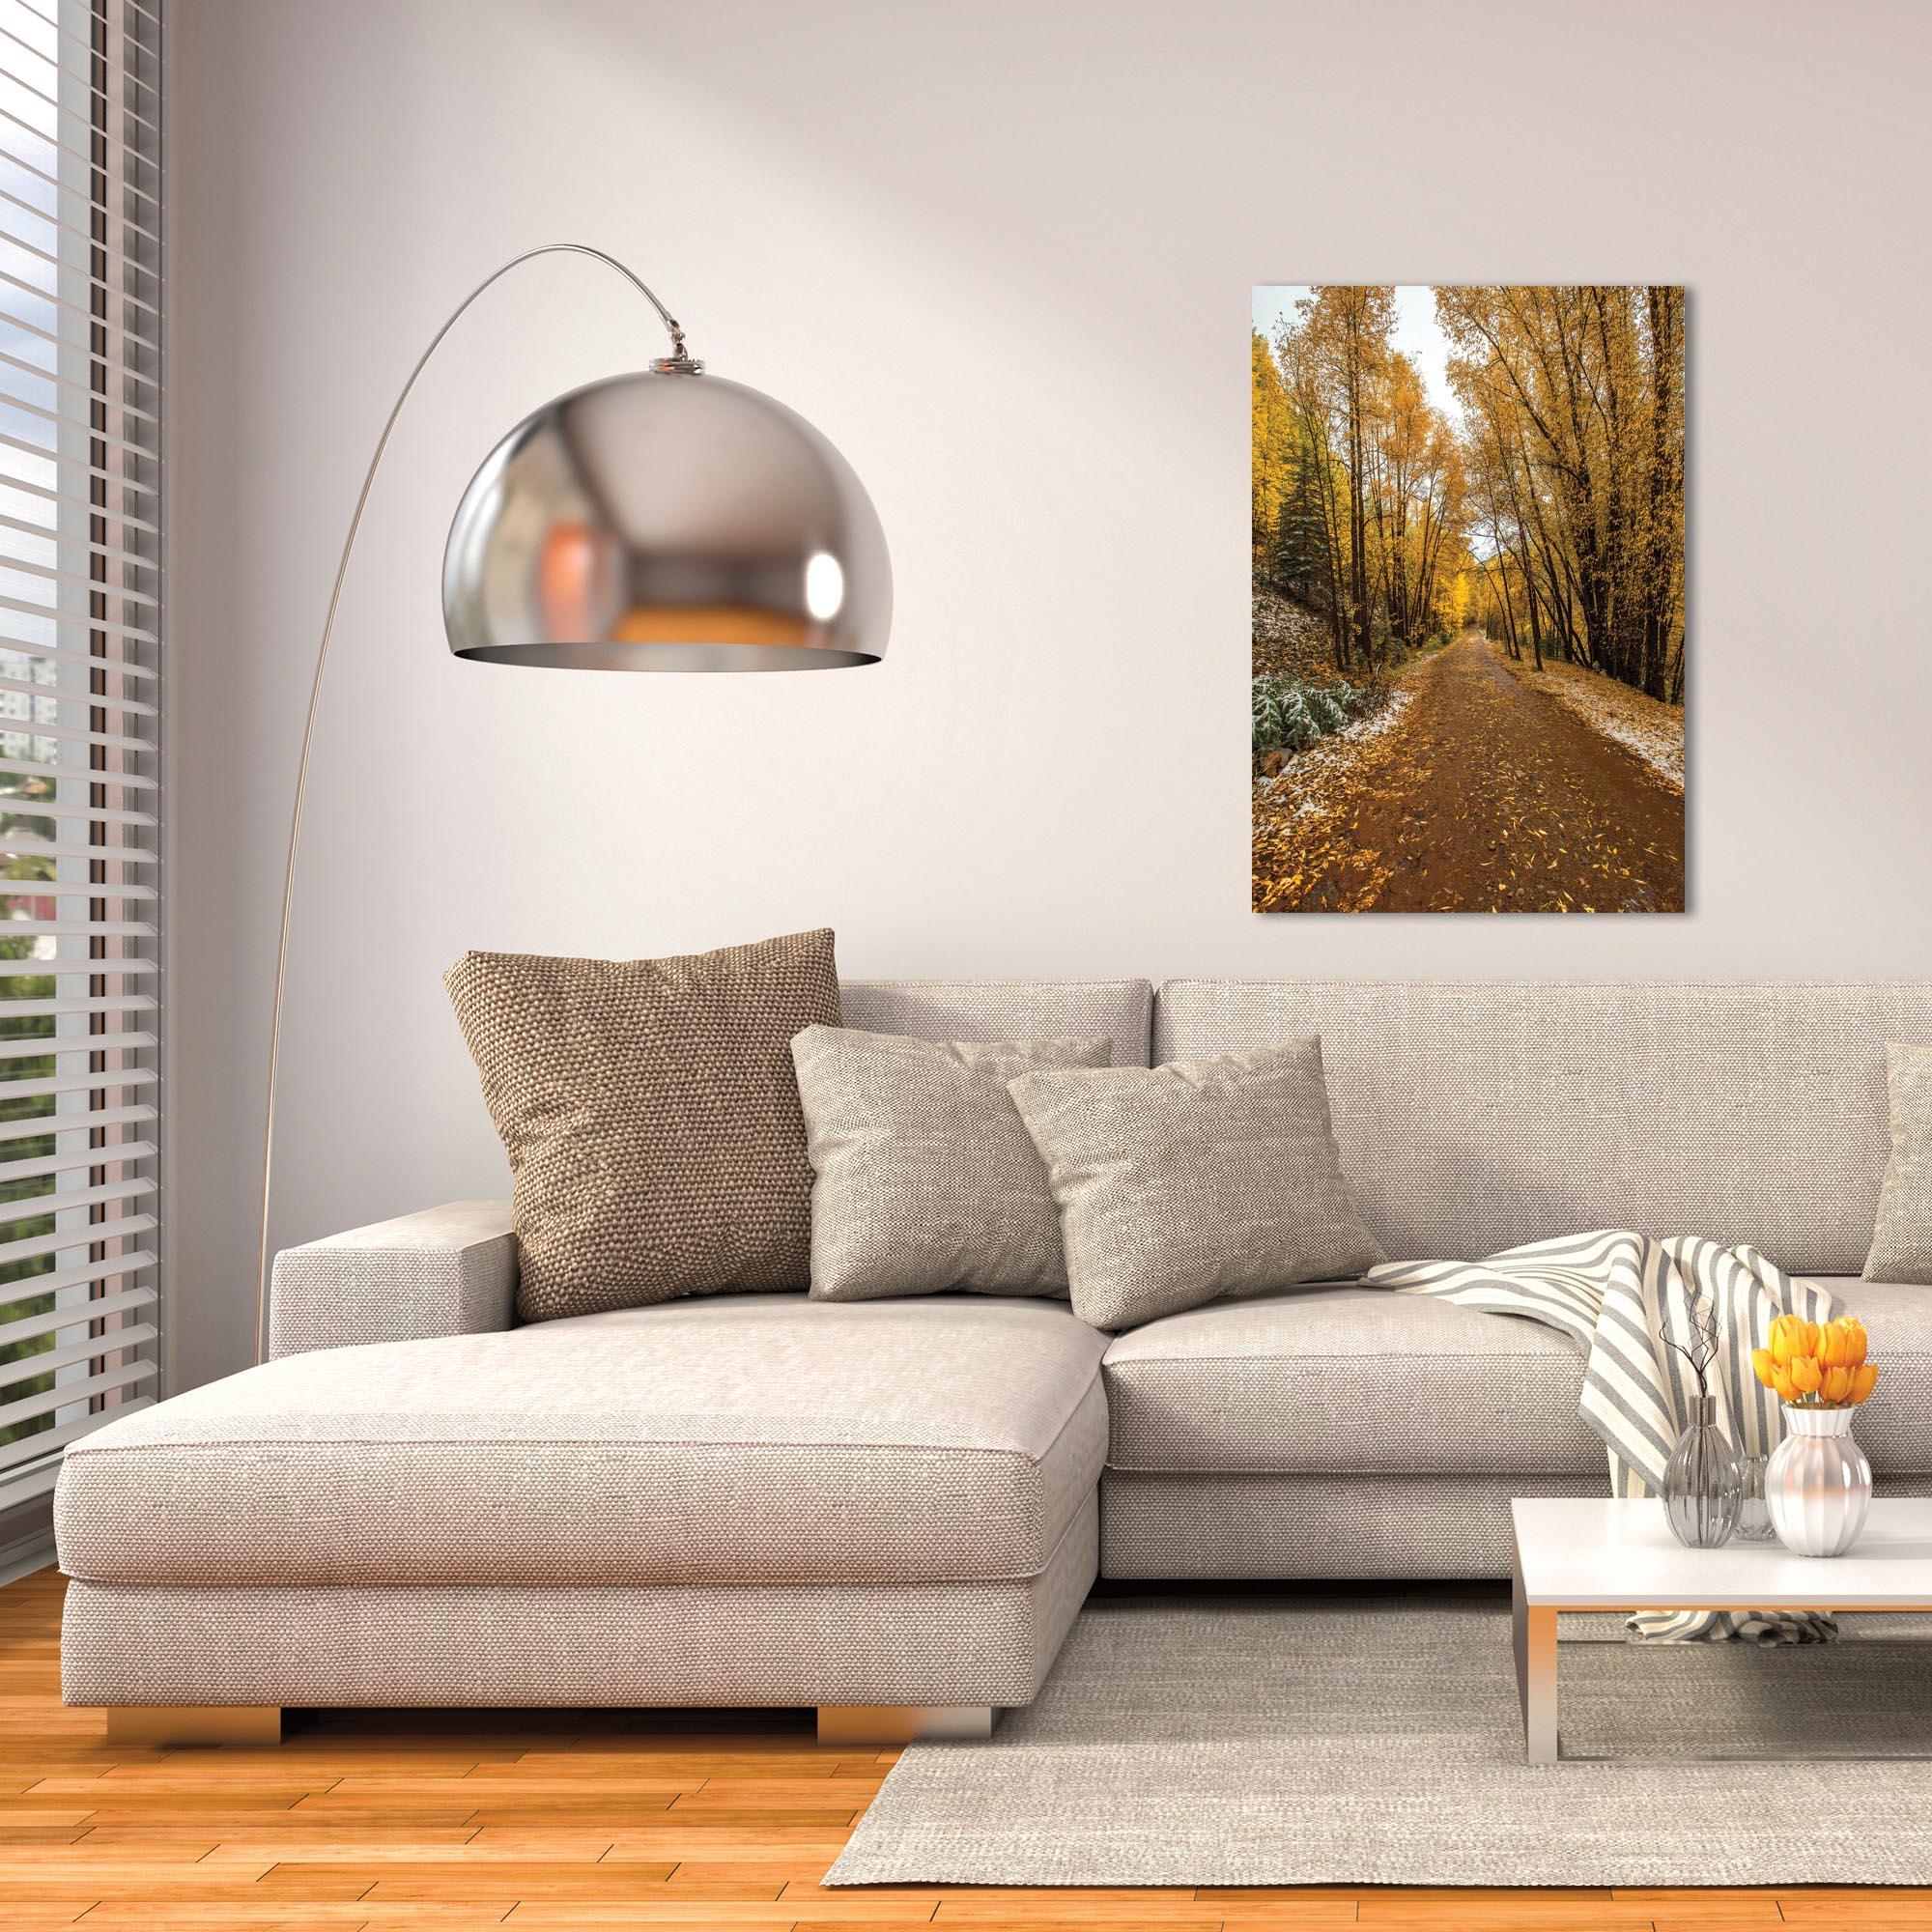 Landscape Photography 'Mountain Pass' - Autumn Trees Art on Metal or Plexiglass - Lifestyle View